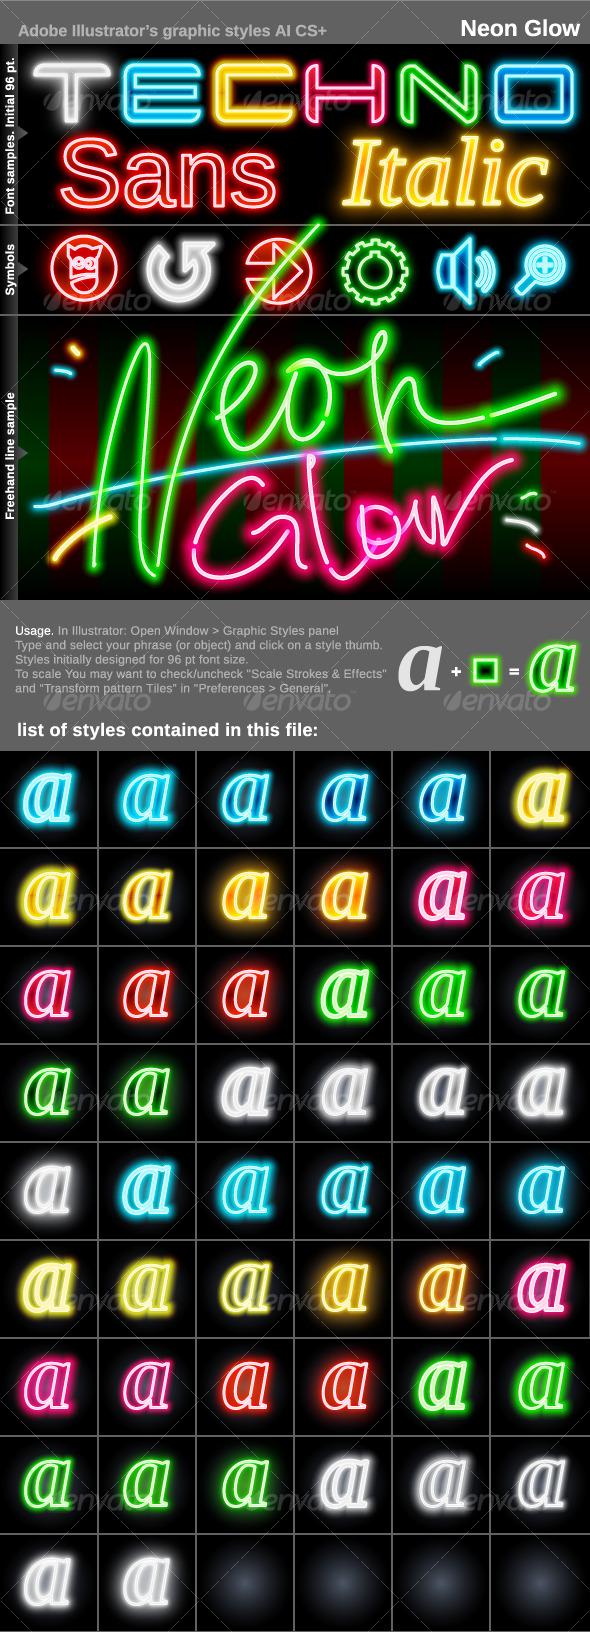 GraphicRiver Illustrator Graphic Styles Neon Glow 121050